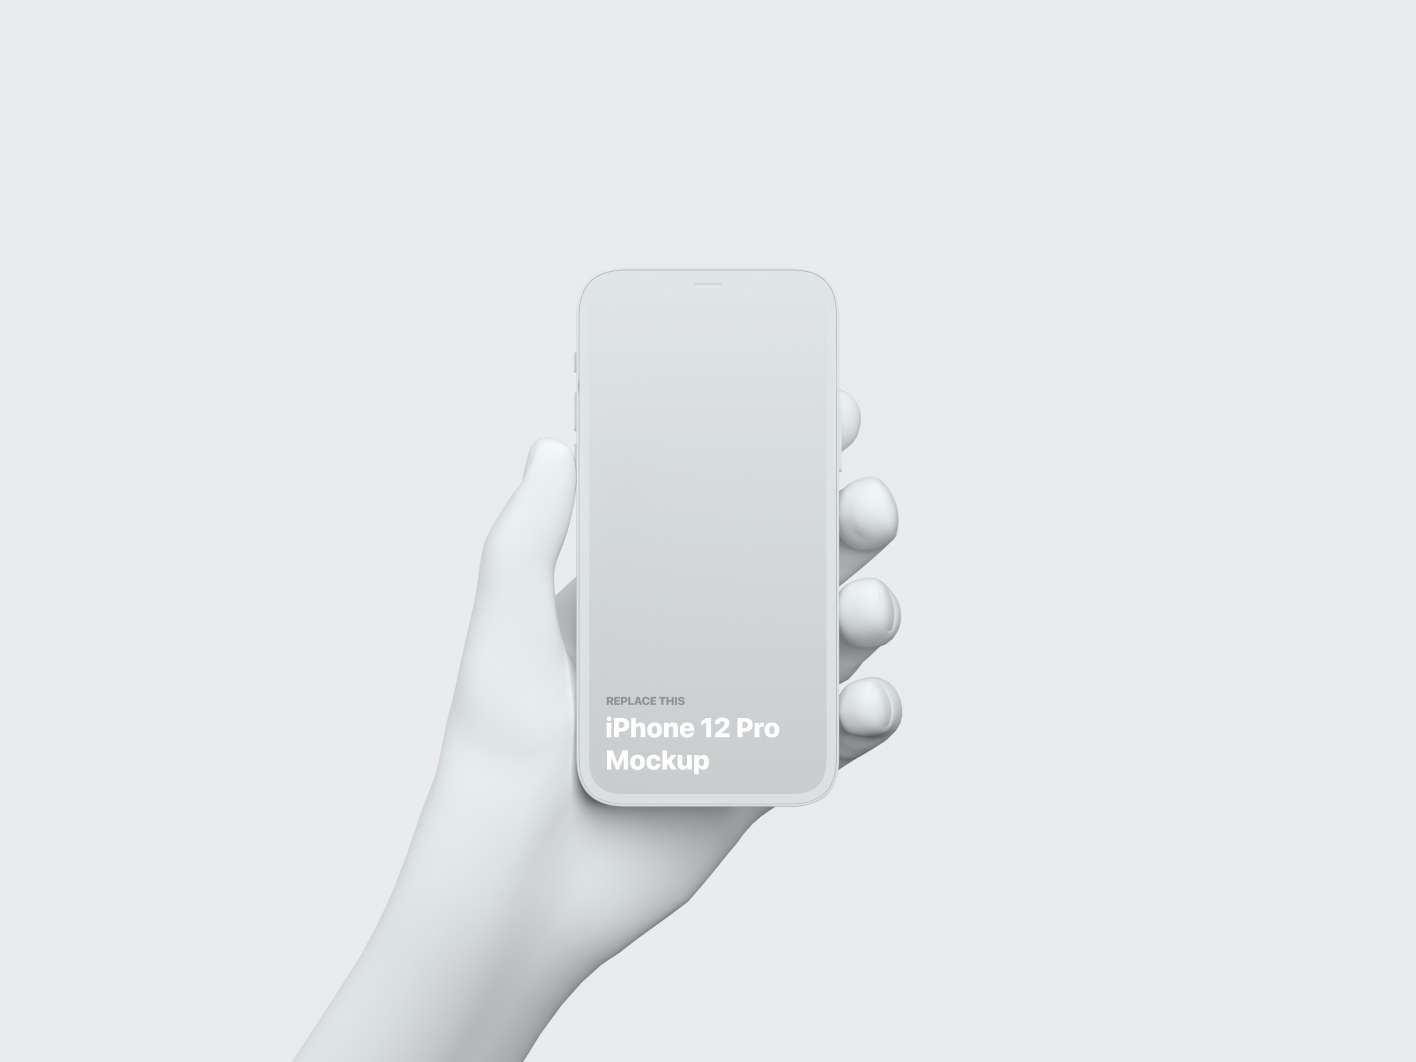 left-hand-holding-iphone-12-pro